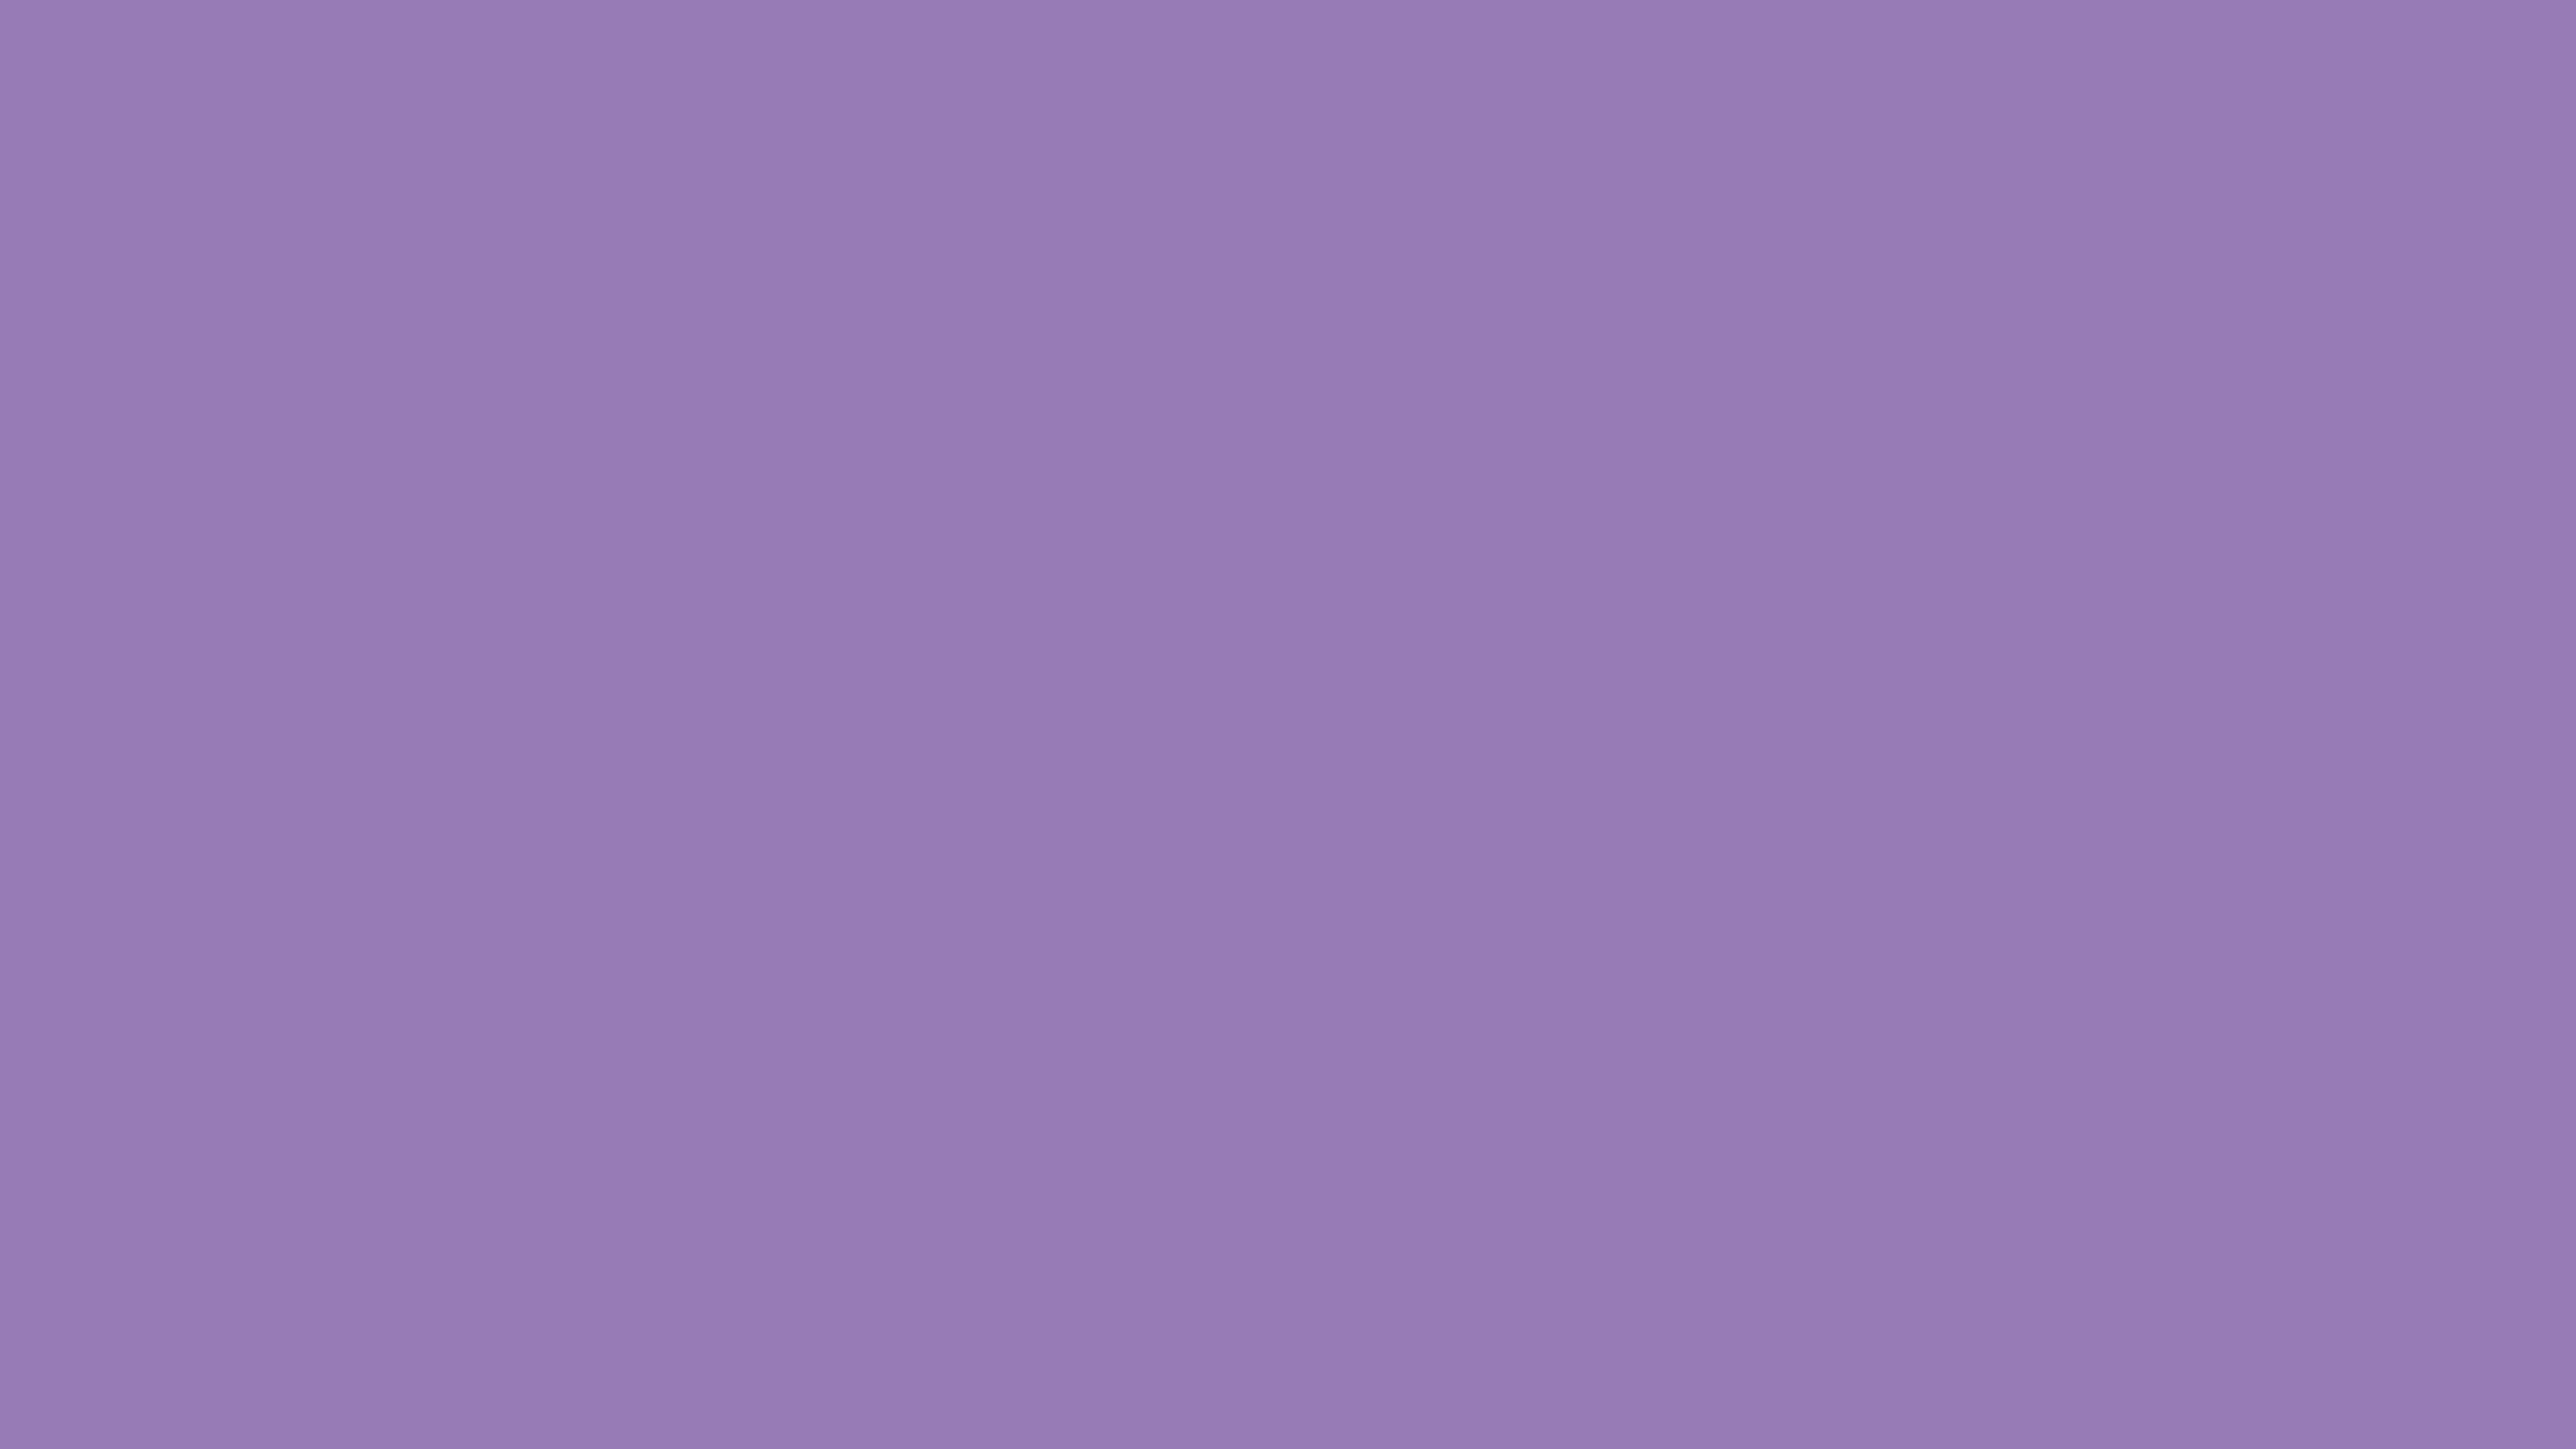 7680x4320 Lavender Purple Solid Color Background